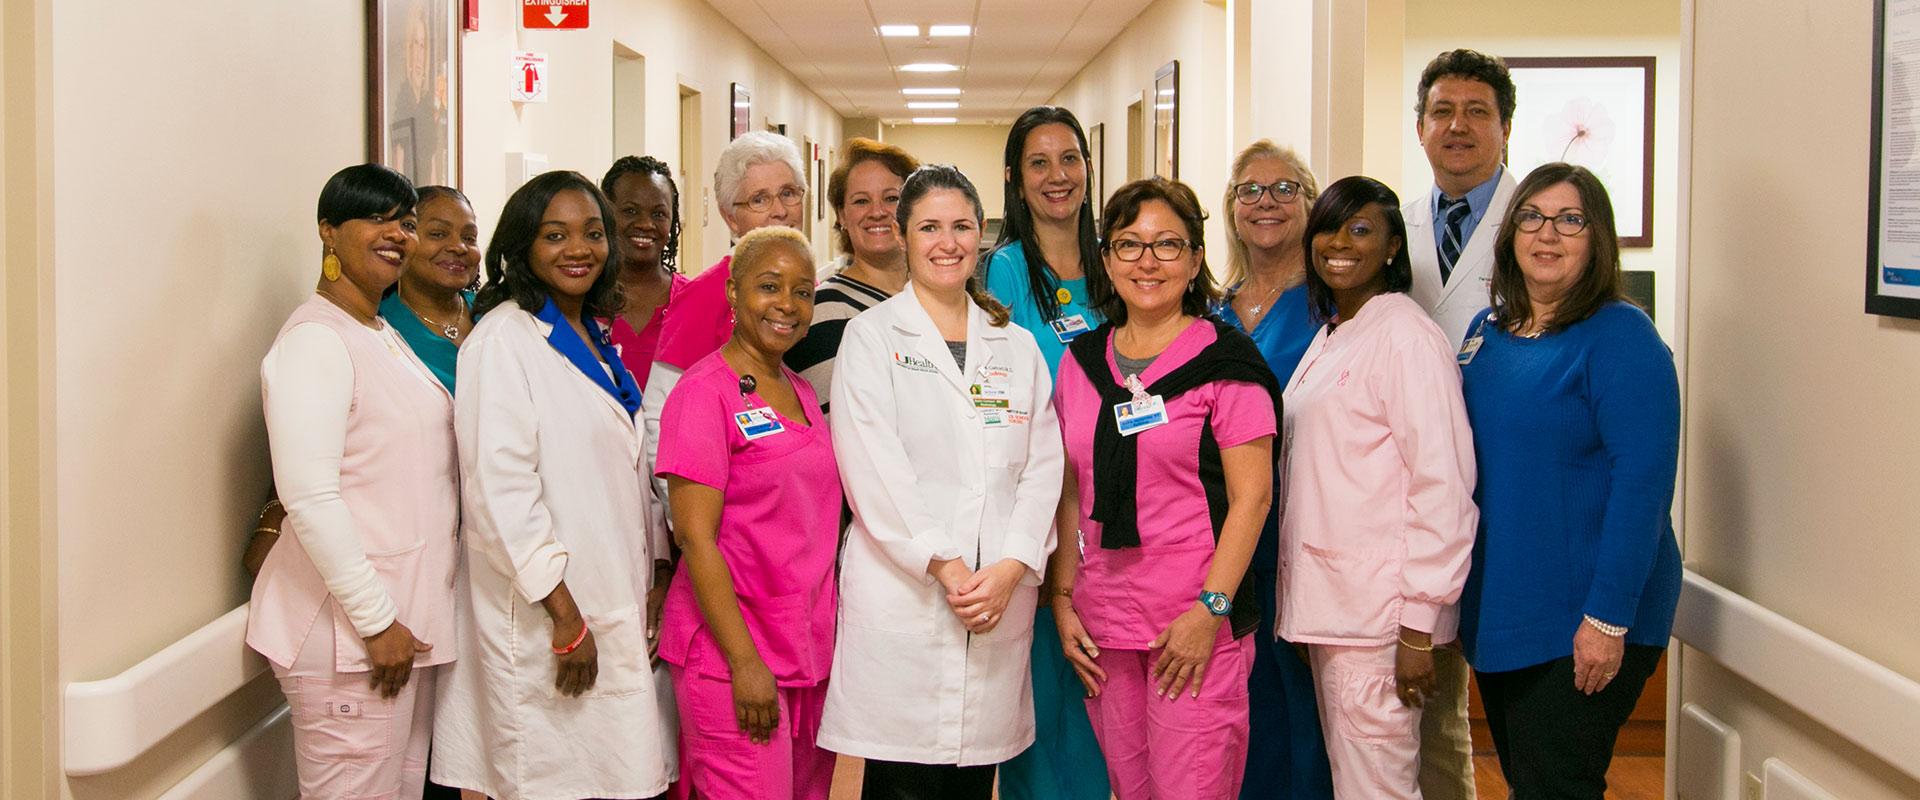 Michelle McPhee Mammography Technician Taylor Breast Health Center - Roberta Orlen Chaplin Digital Breast Imaging Center Jackson Memorial Hospital